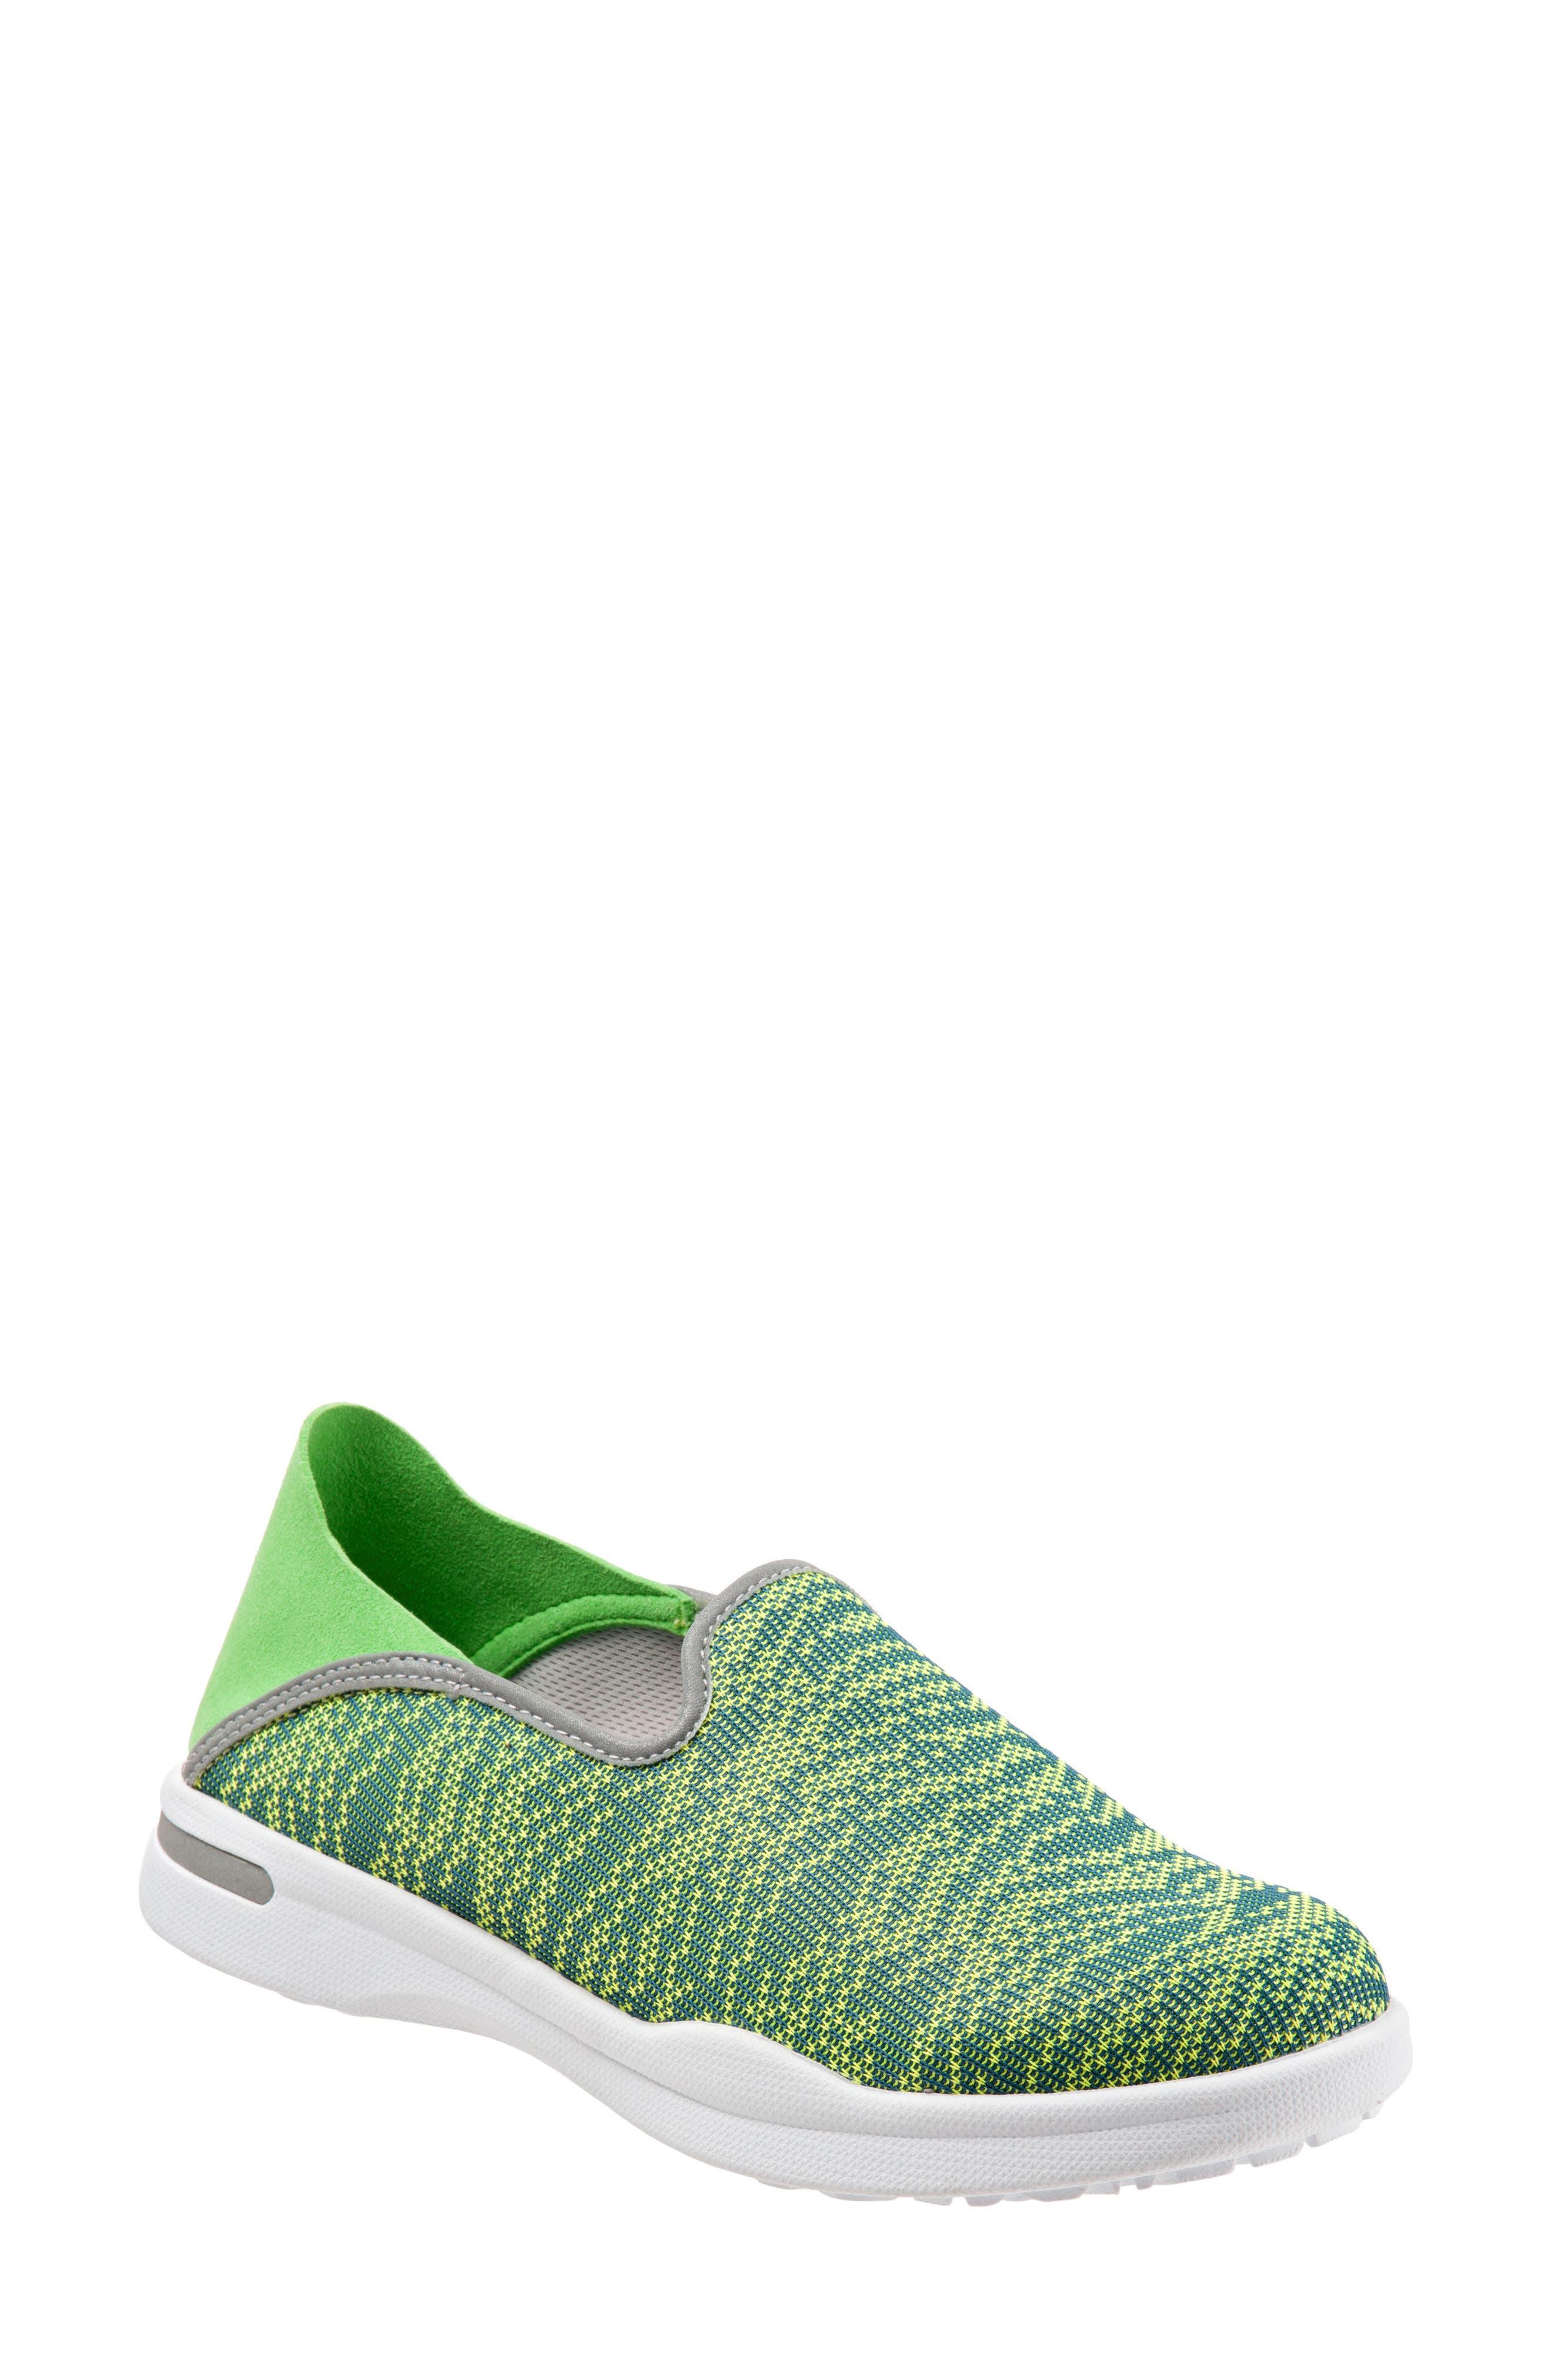 Convertible Slip-On Sneaker,                             Main thumbnail 1, color,                             Green Fabric